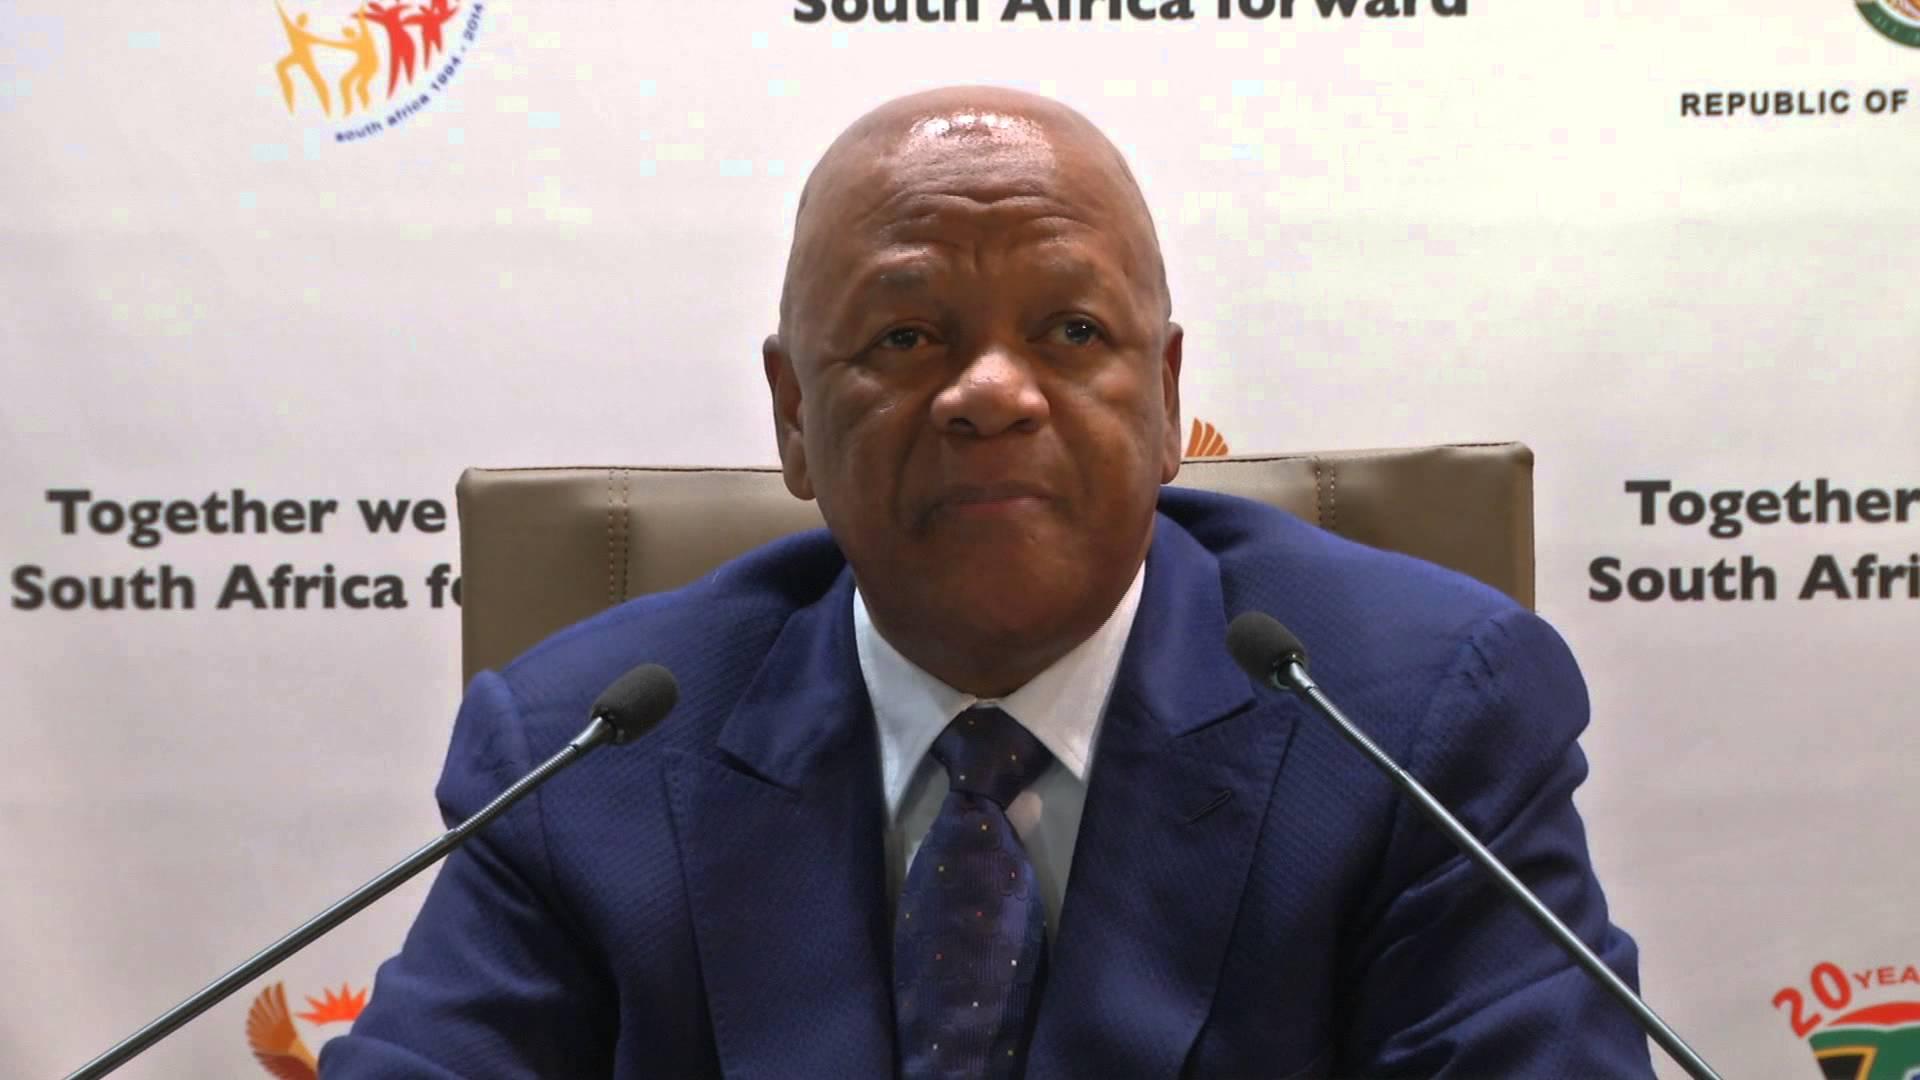 Minister of Energy Jeff Radebe